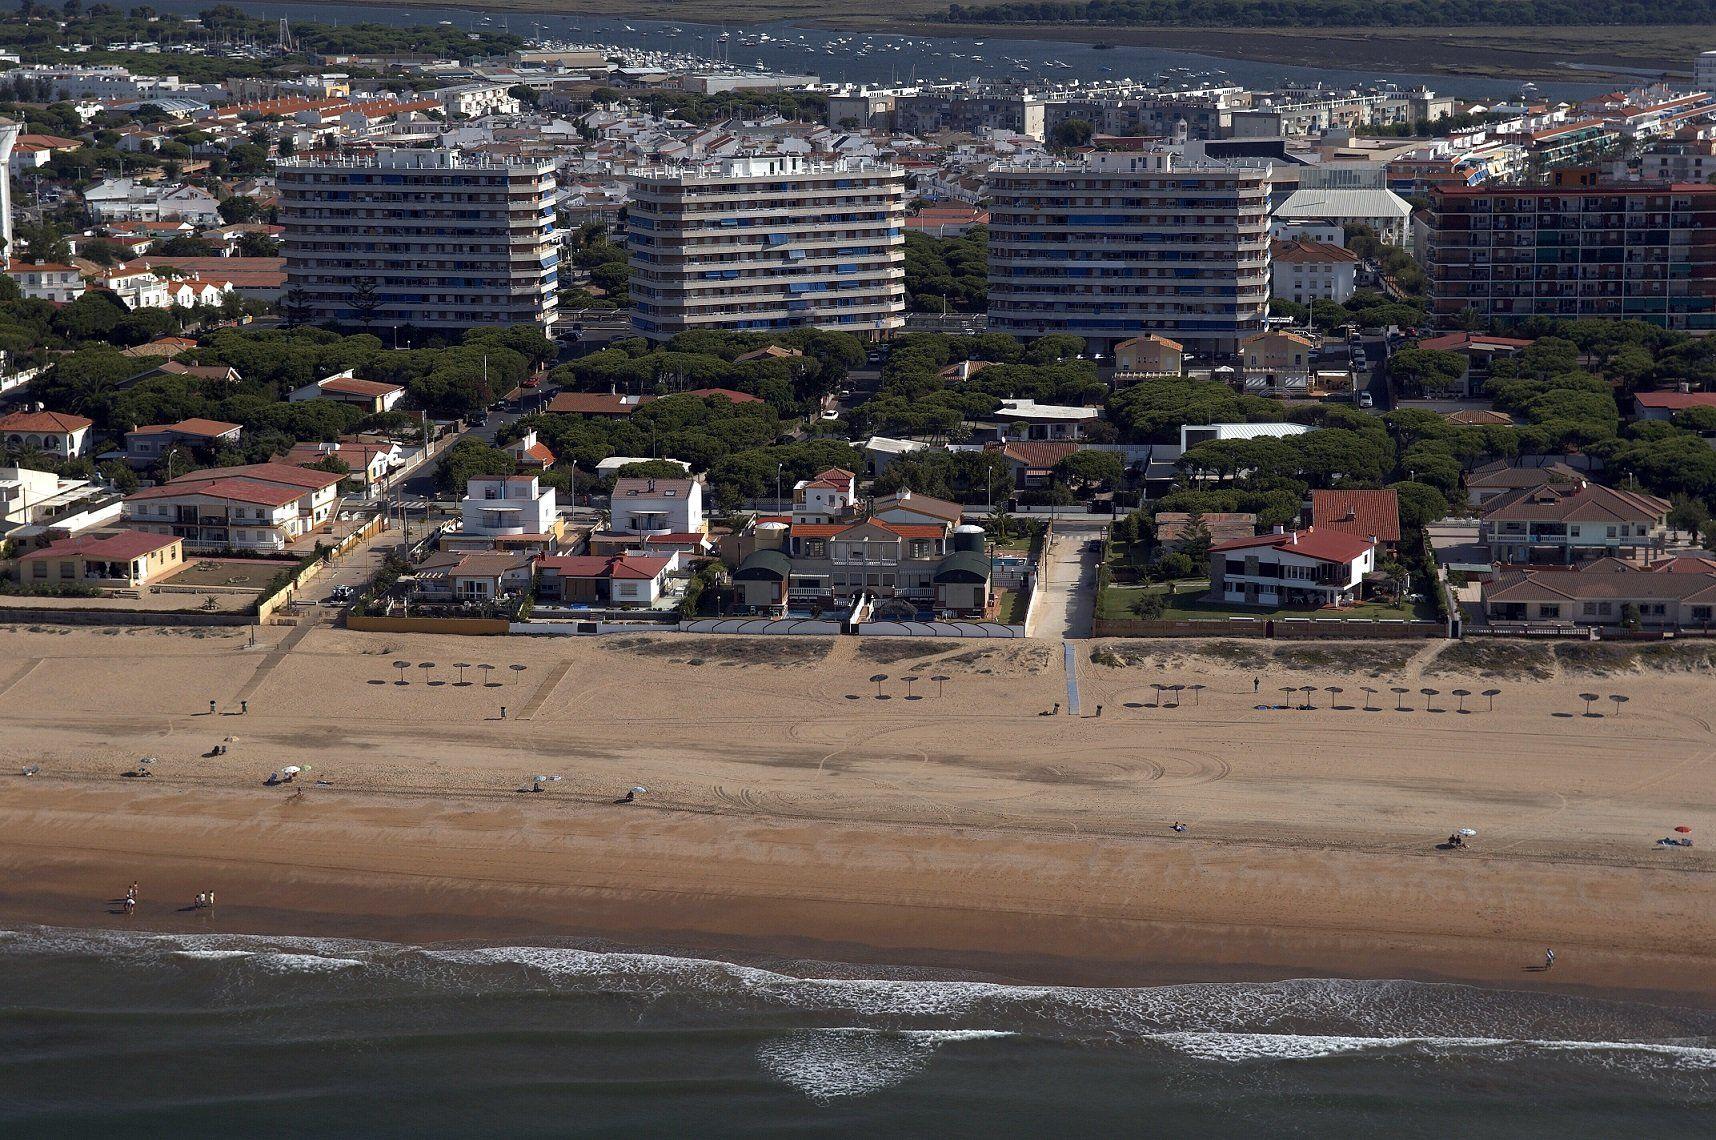 playa-urbana-punta-umbria-costa-compressor